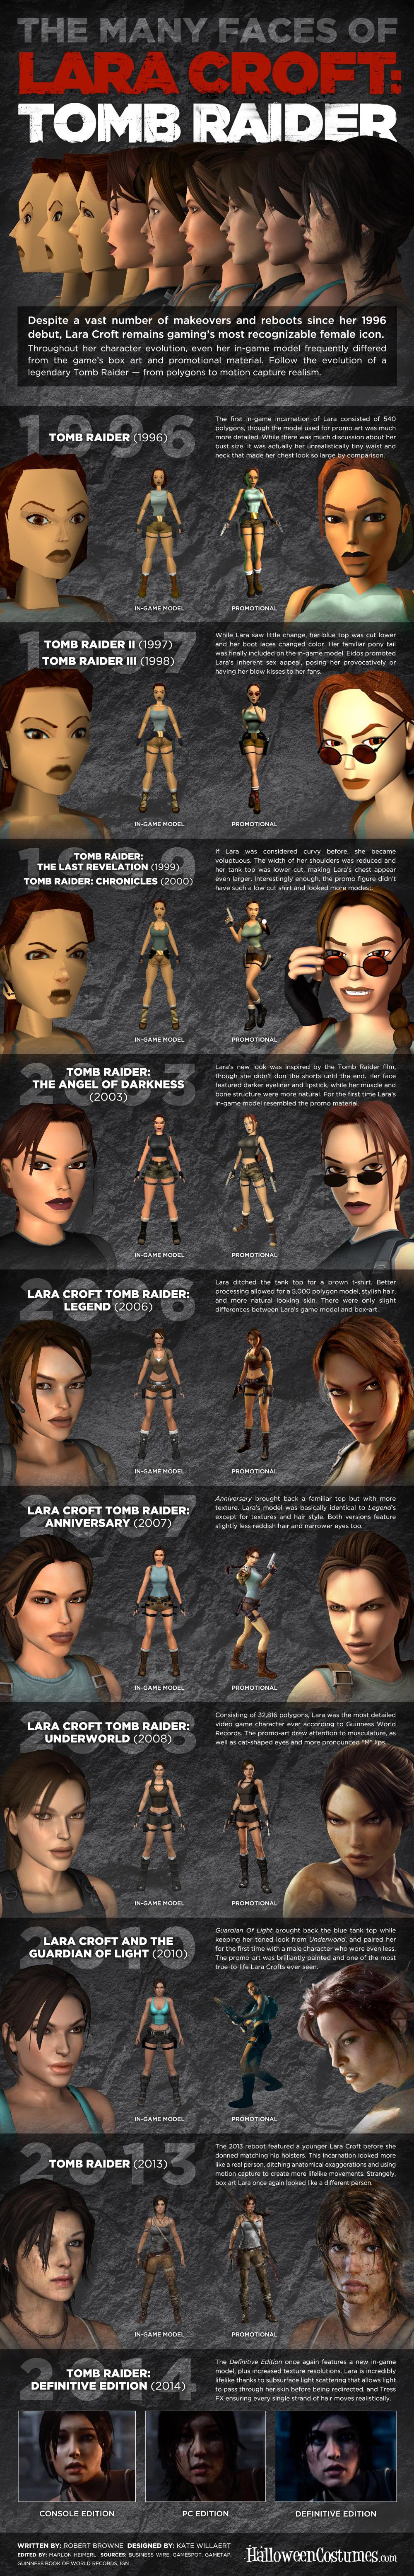 Lara Croft Infographic